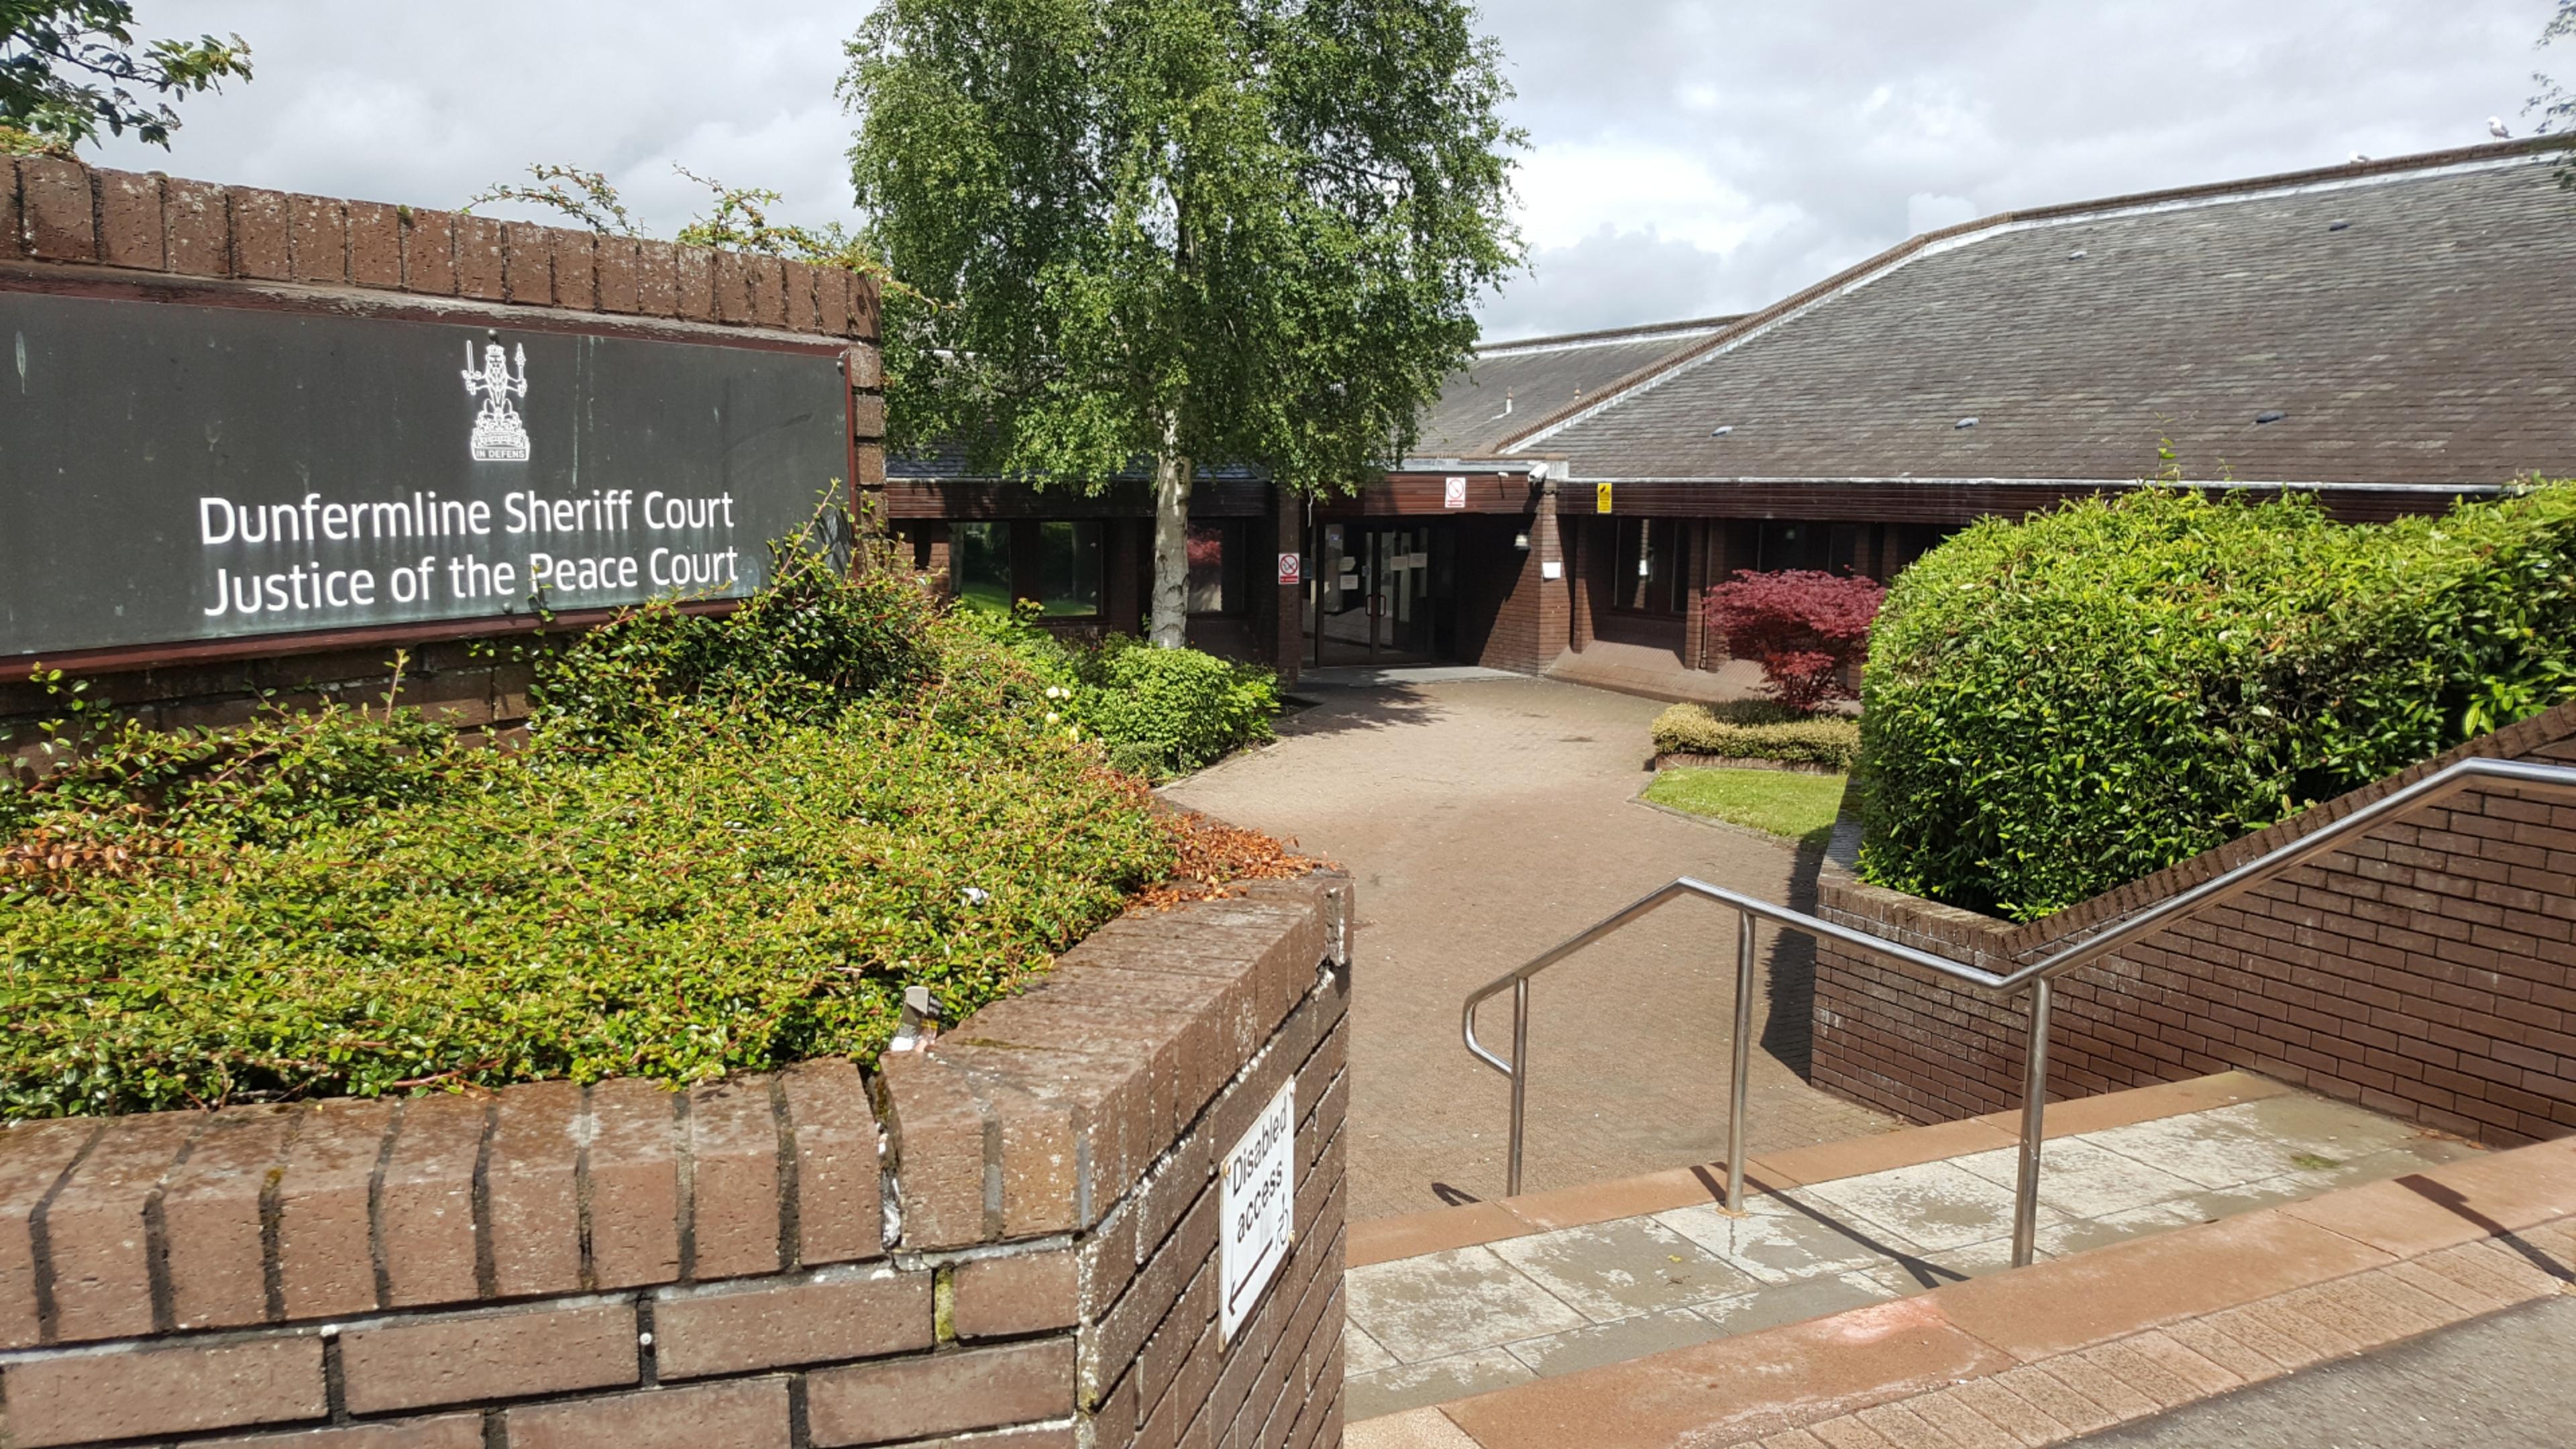 Dunfermline Sheriff Court. Pic taken by Will Lyon.